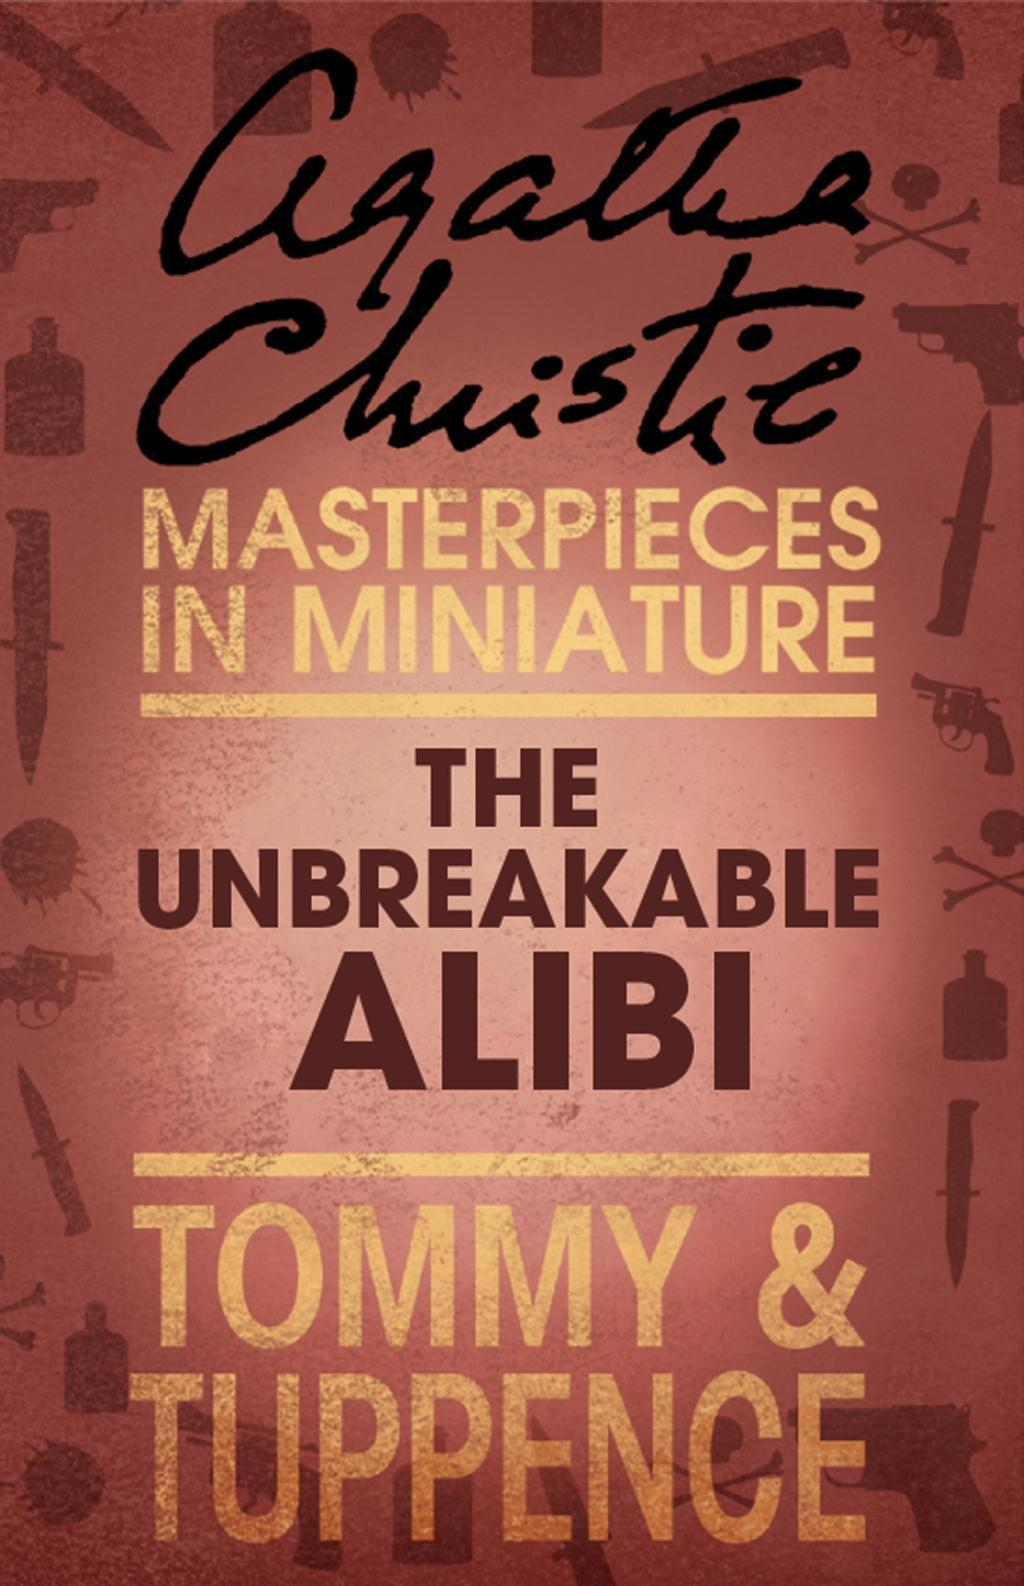 The Unbreakable Alibi: An Agatha Christie Short Story